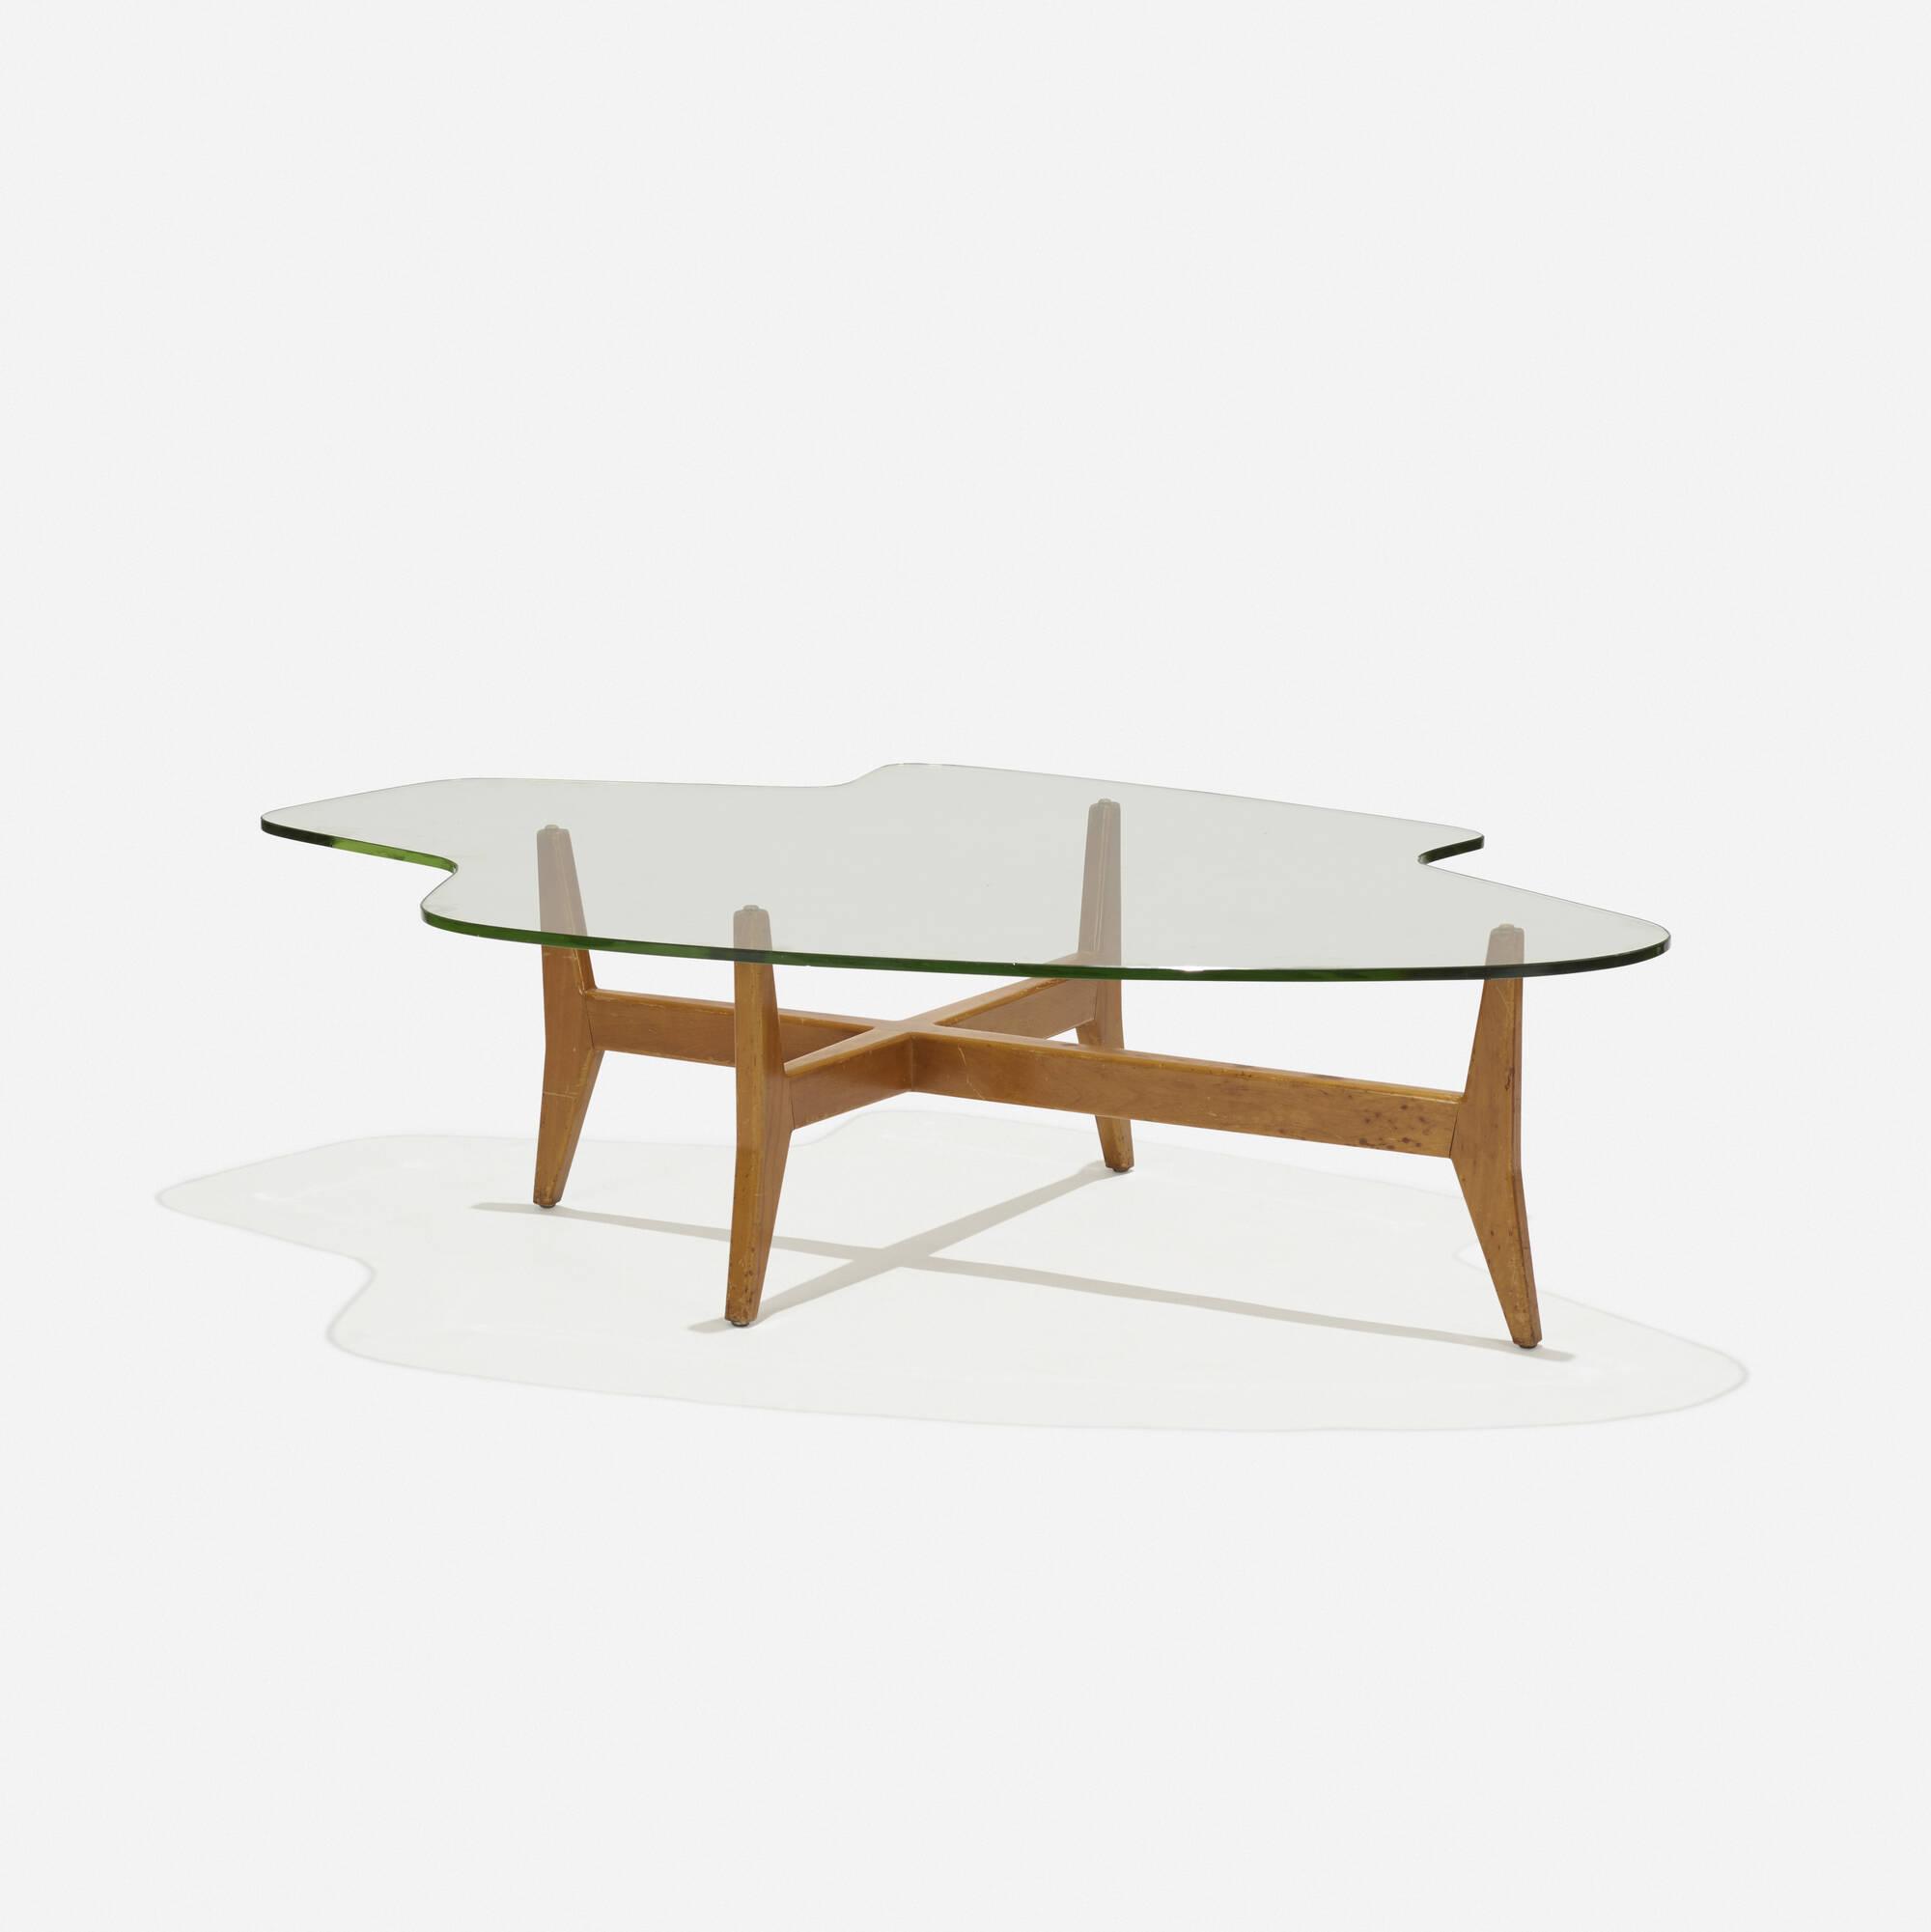 210 jens risom freeshape coffee table model t 362 american 210 jens risom freeshape coffee table model t 362 1 of geotapseo Choice Image